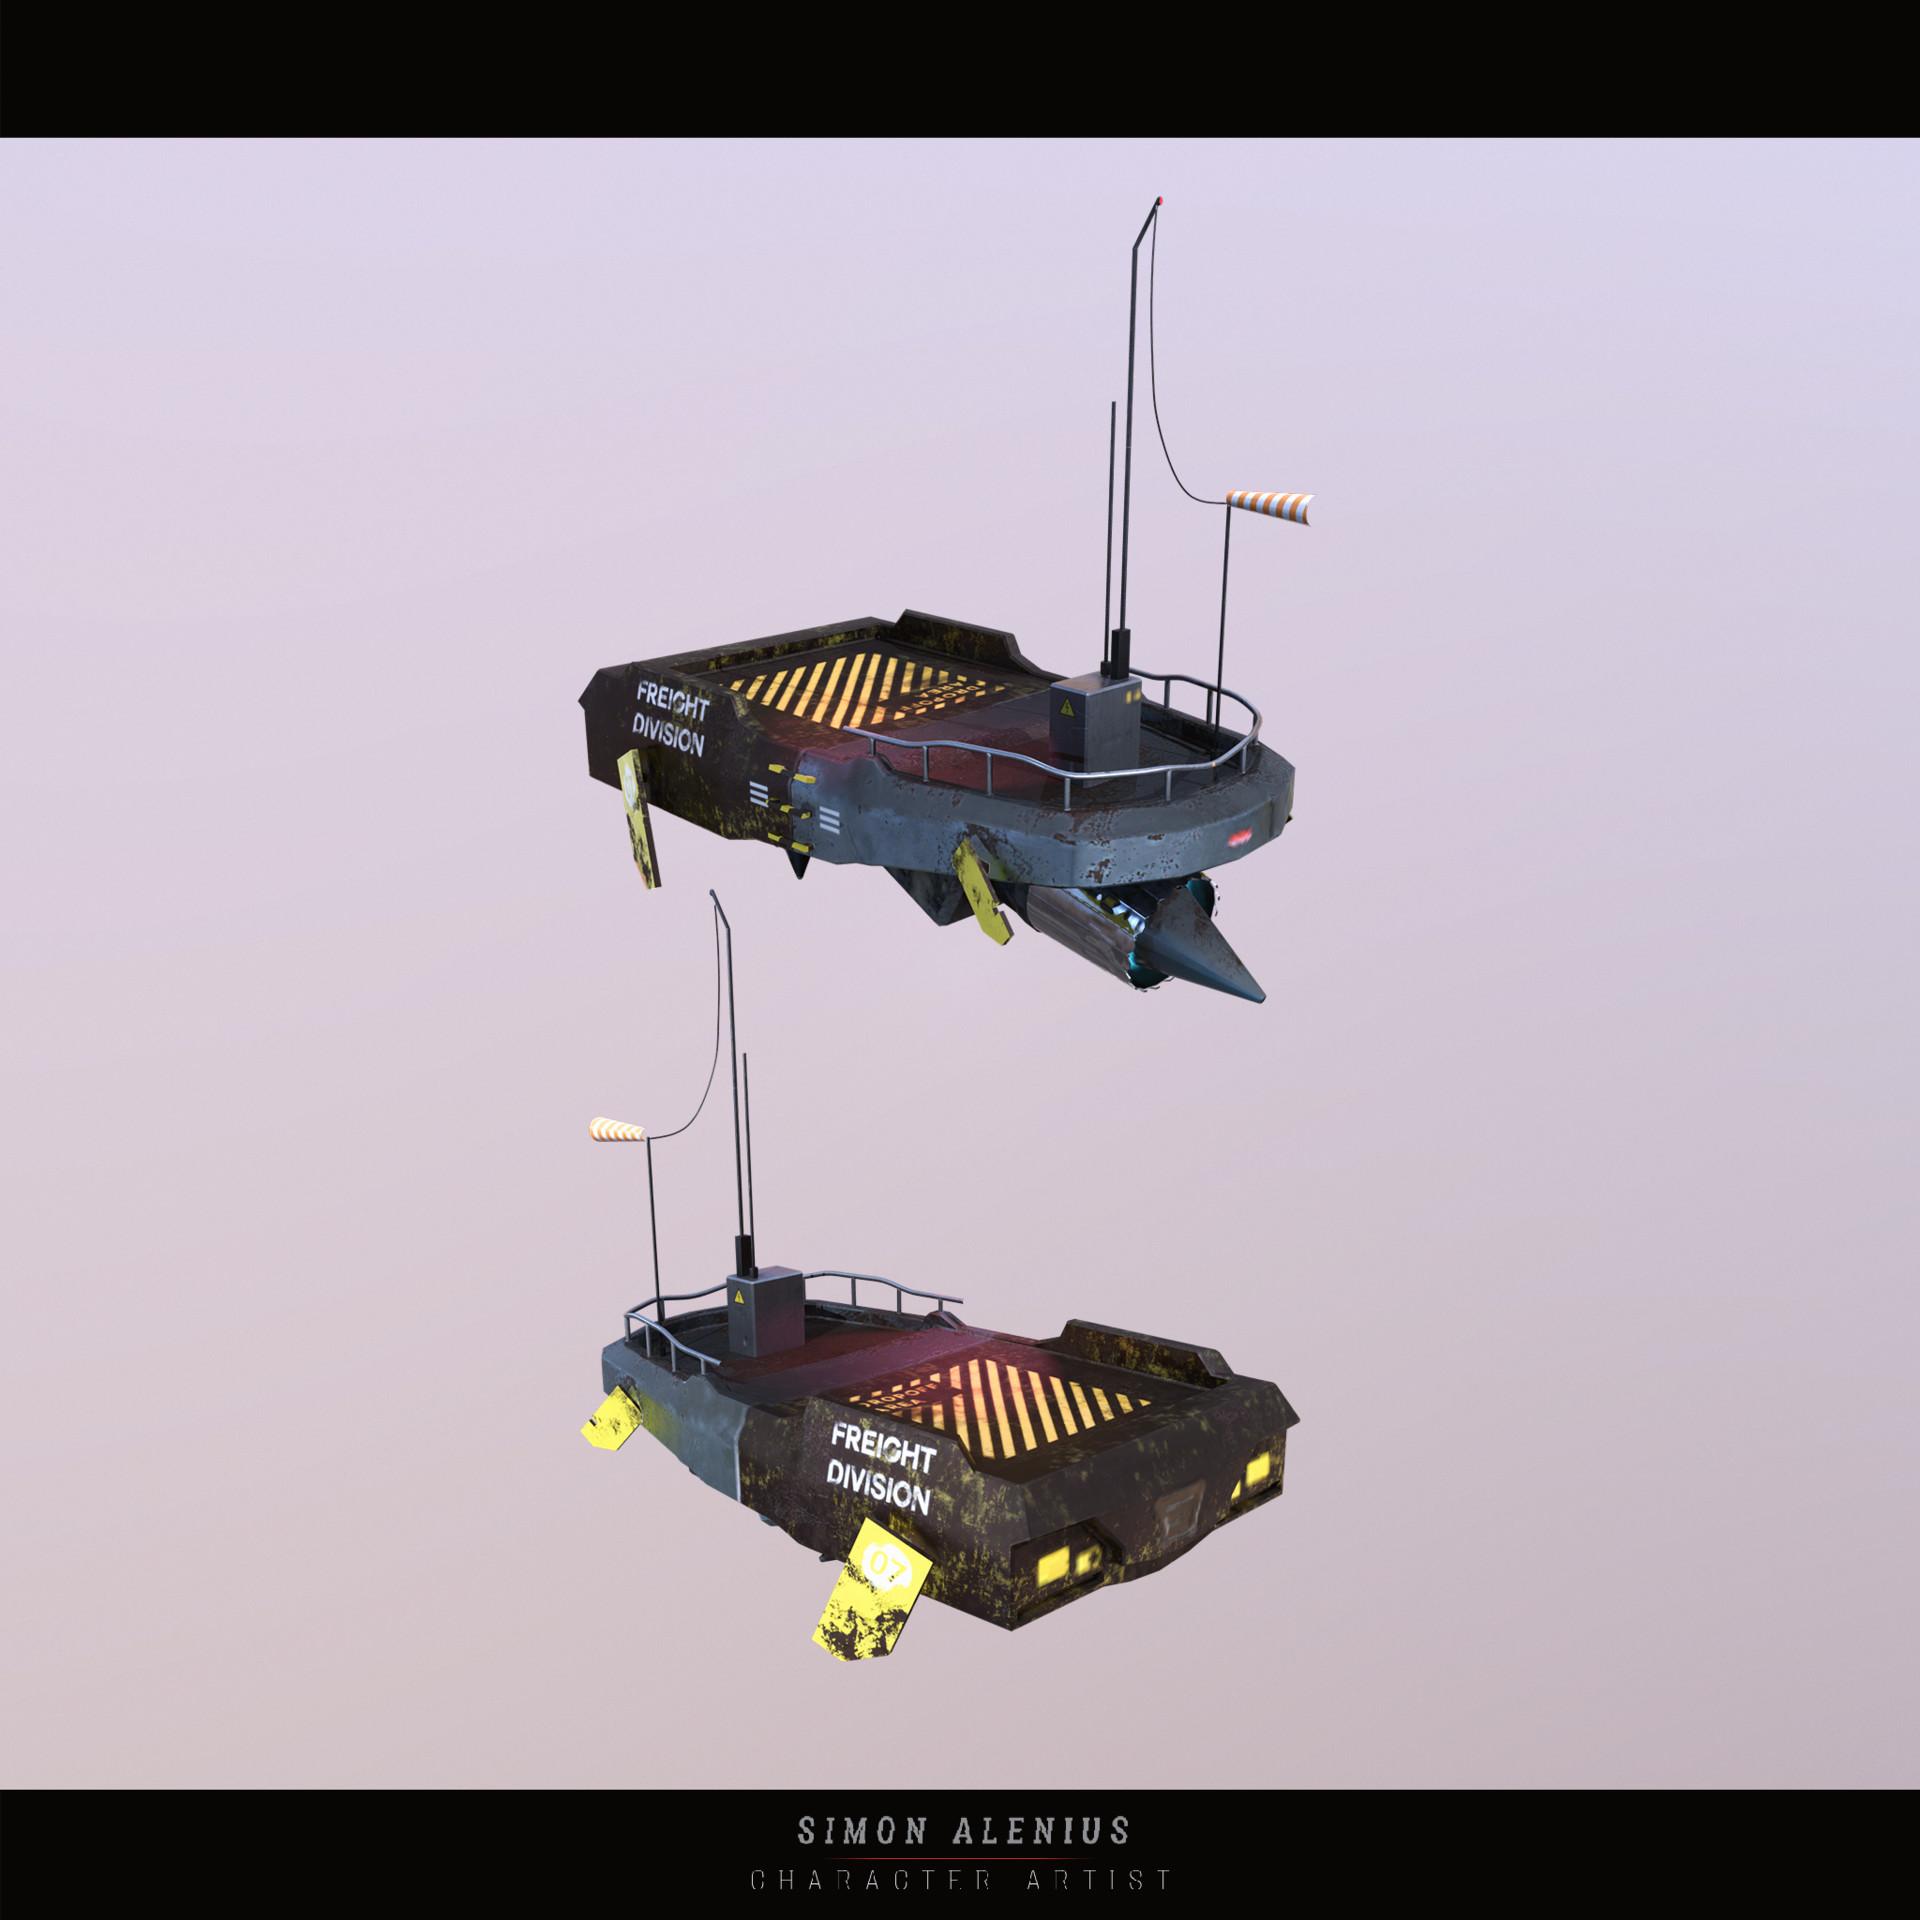 Simon alenius cargoship 01